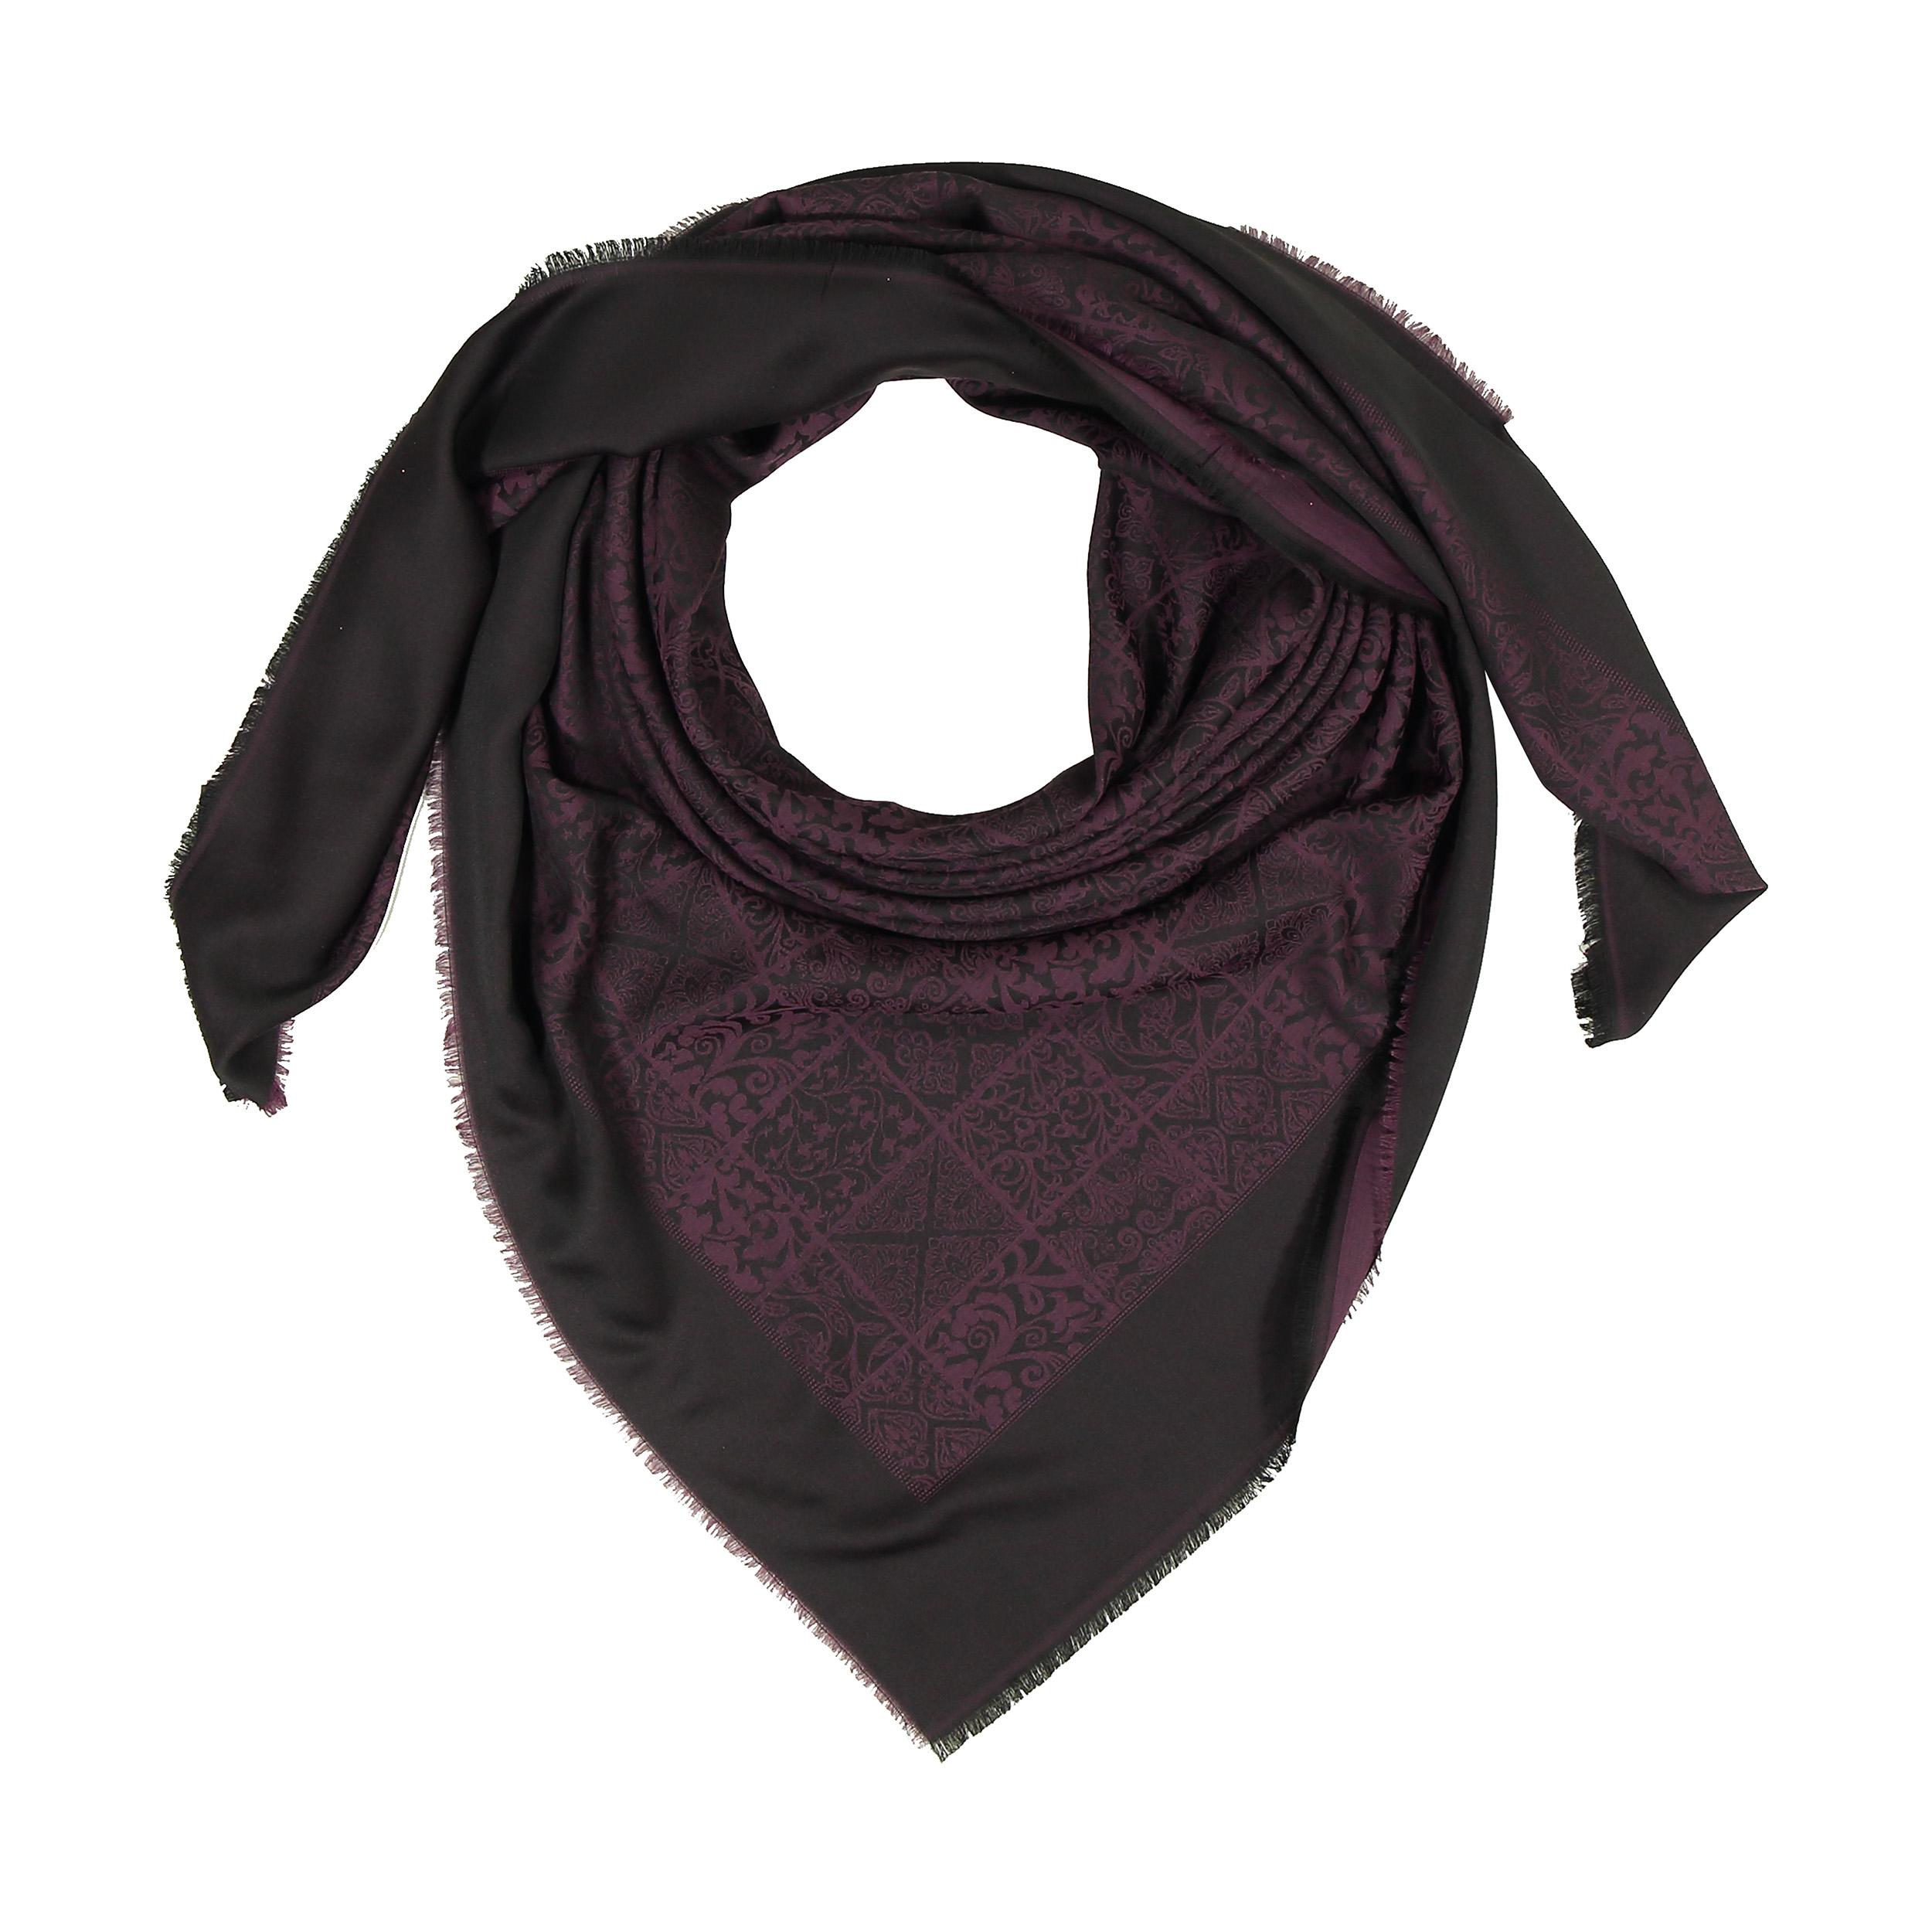 روسری زنانه توتو کد 5222